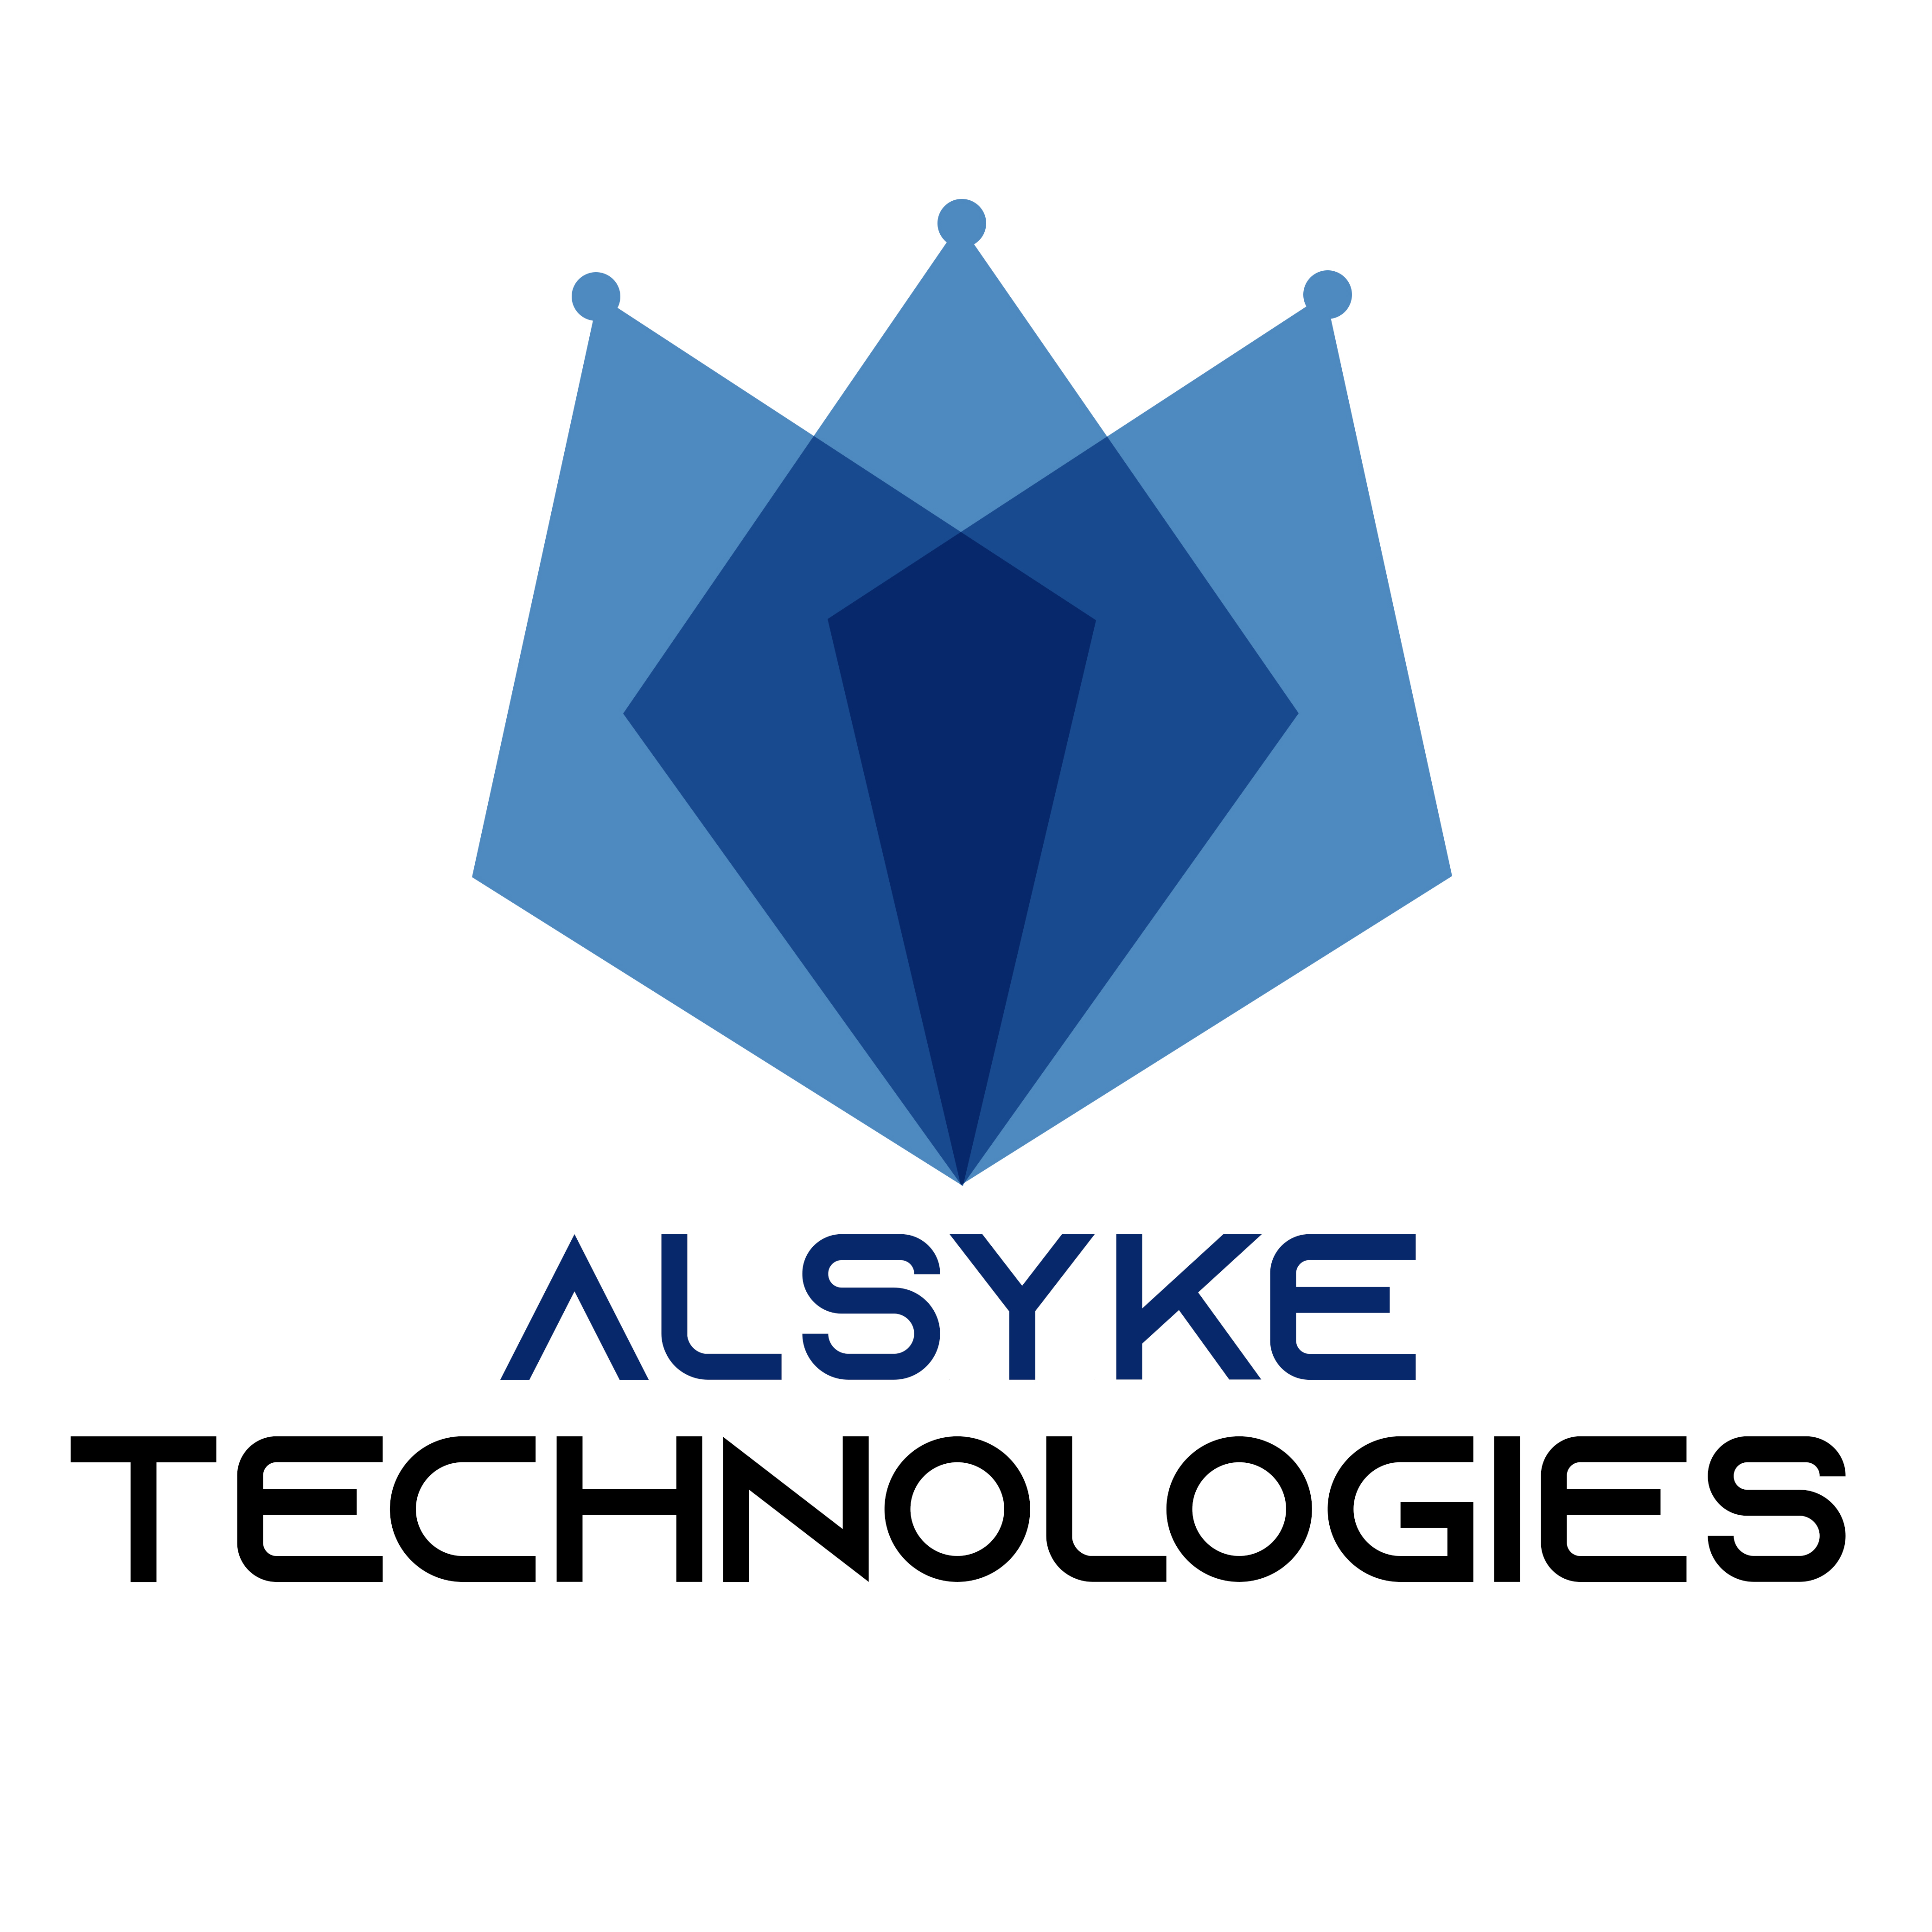 Alsyke Technologies Logo